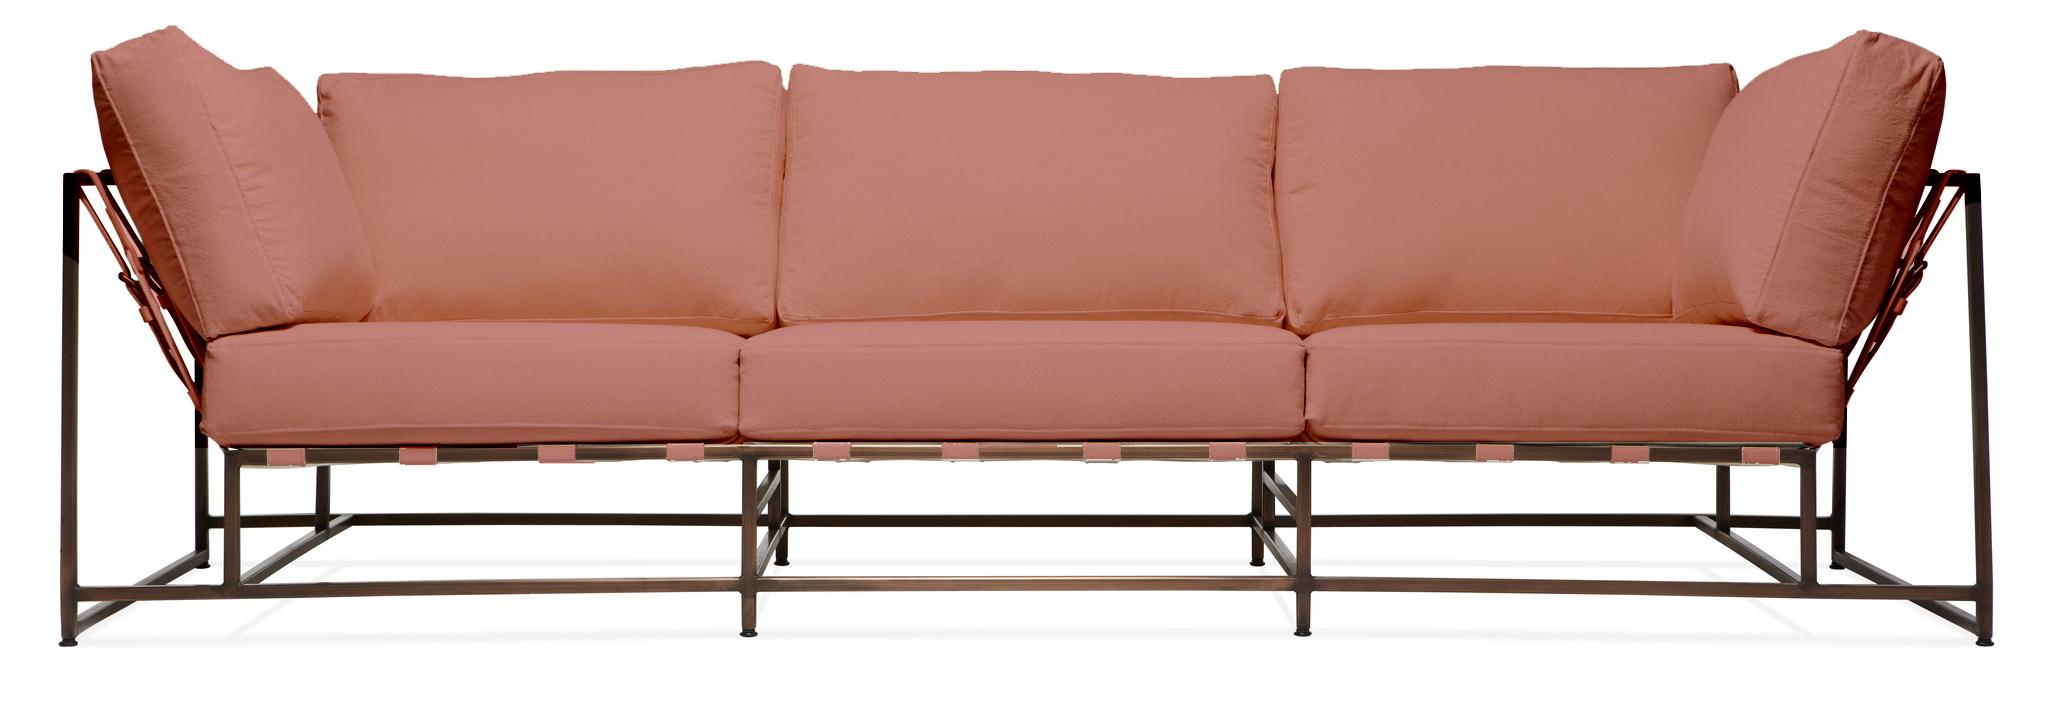 sofa xxl malvarrosa